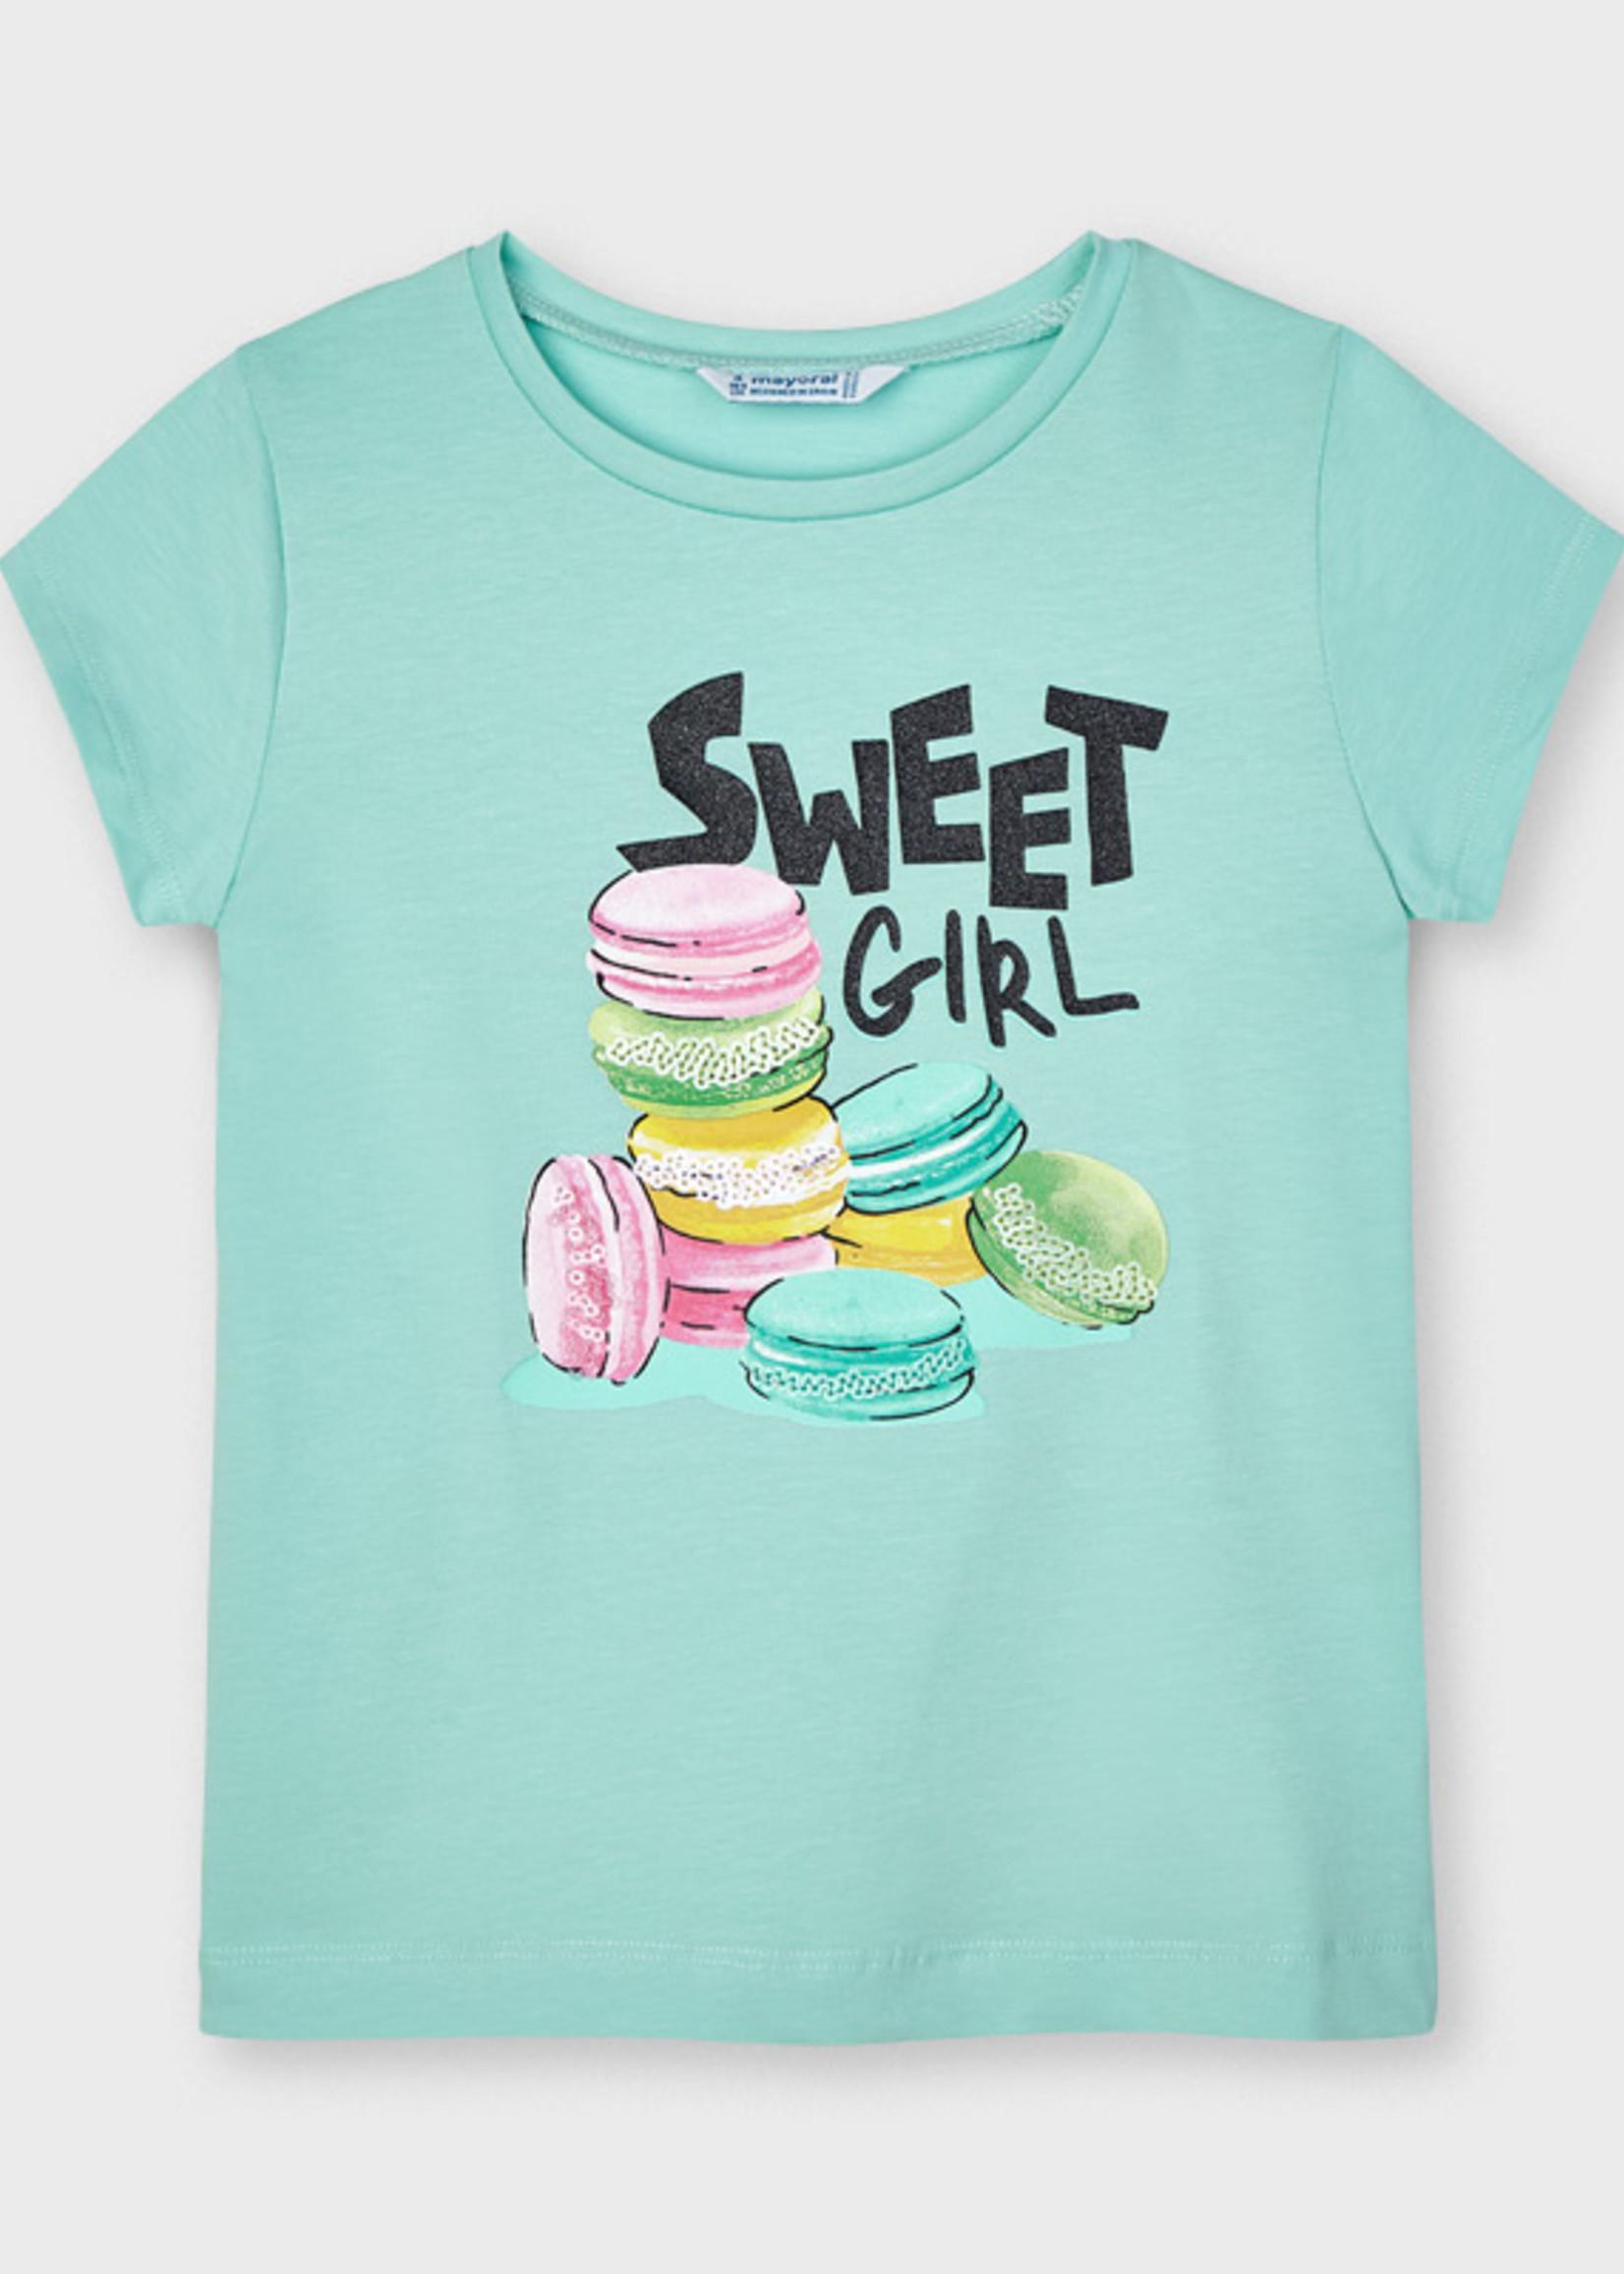 Mayoral Mayoral sweet girl shirt